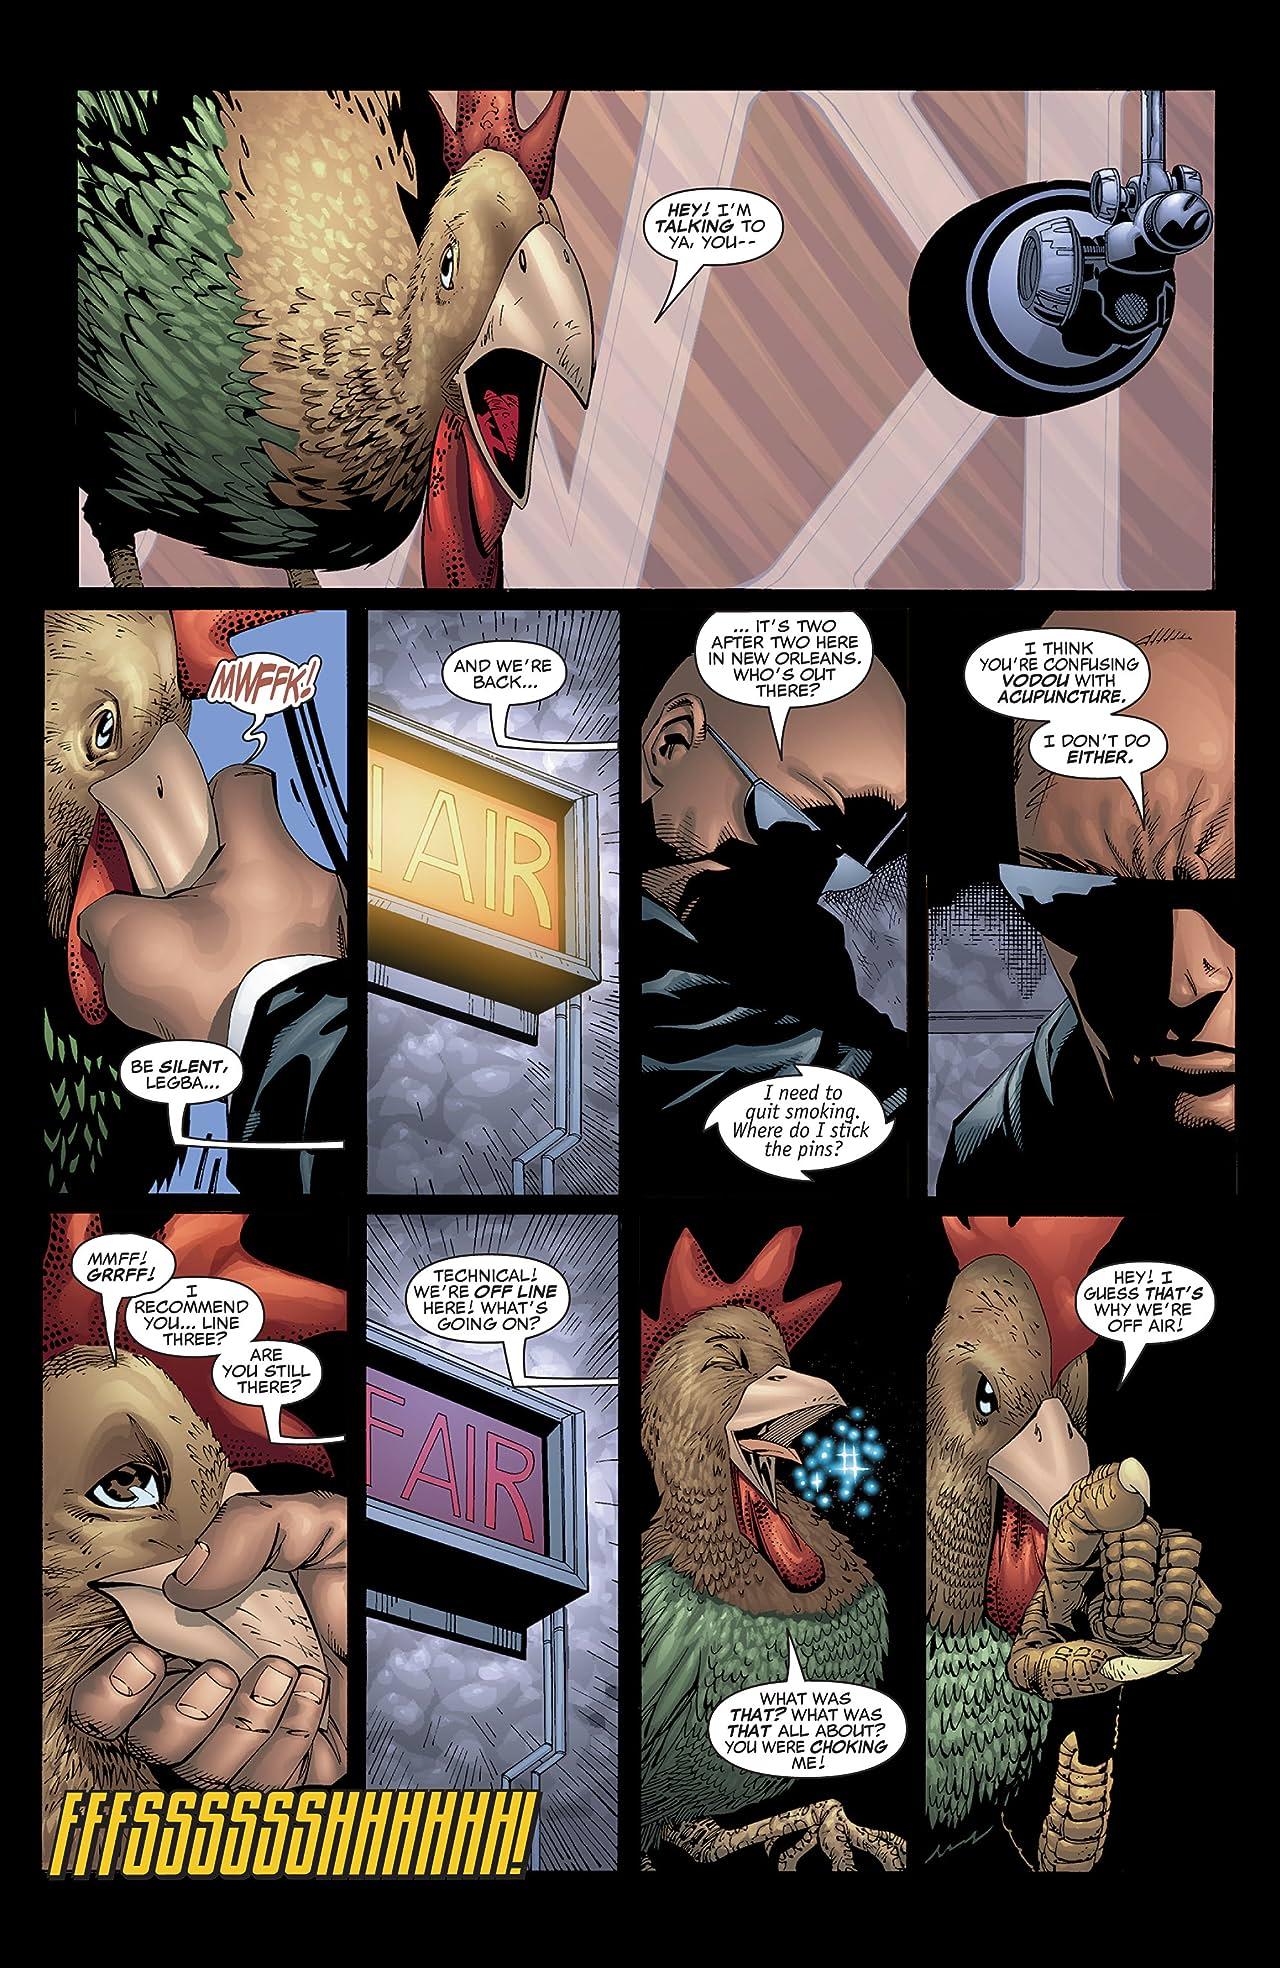 Shadowman (1999) #2